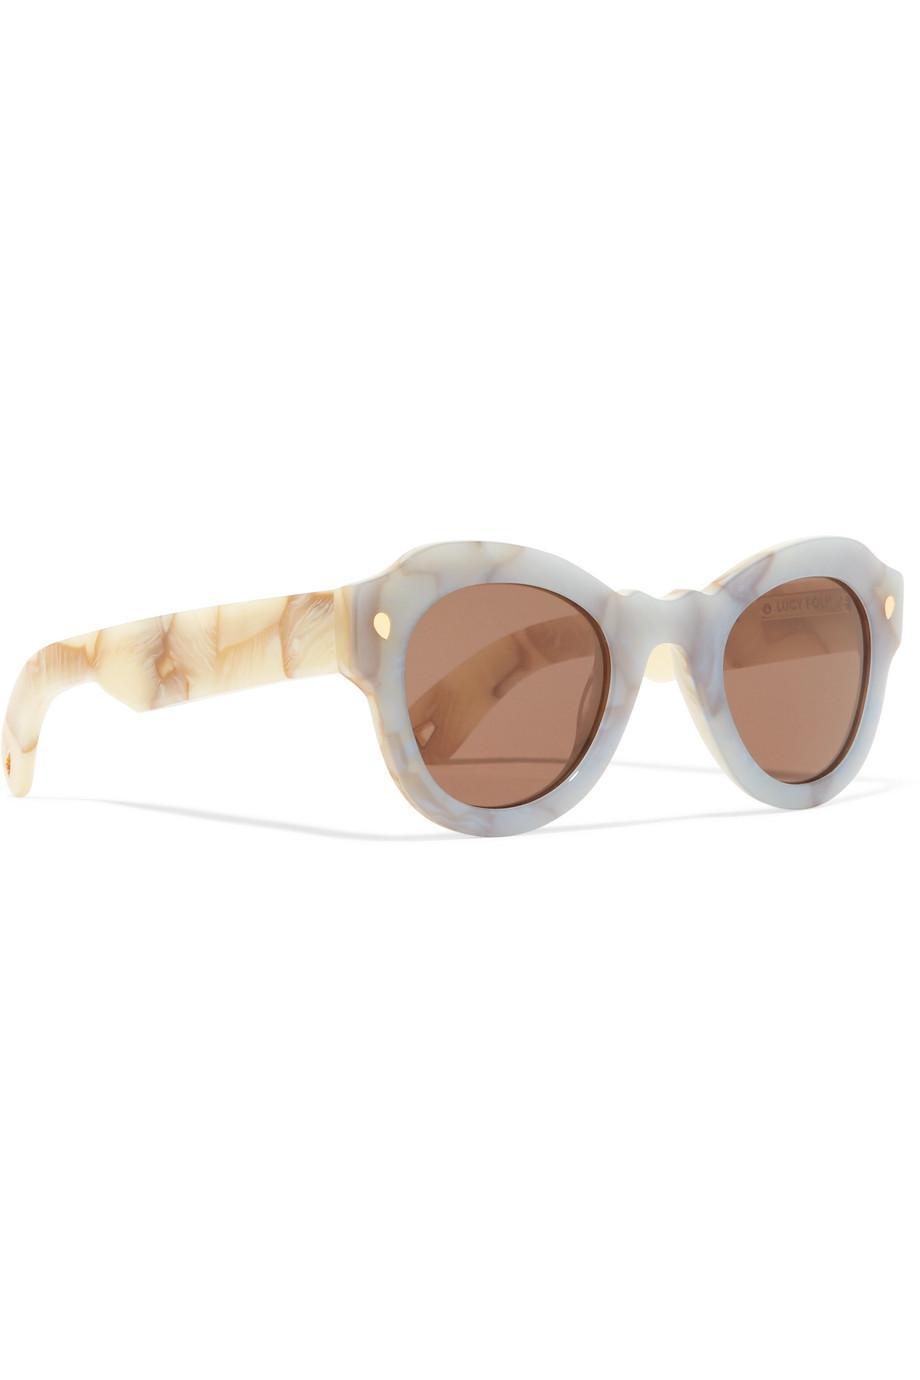 Fly Away Round-frame Acetate Sunglasses - Blue Lucy Folk VPpad